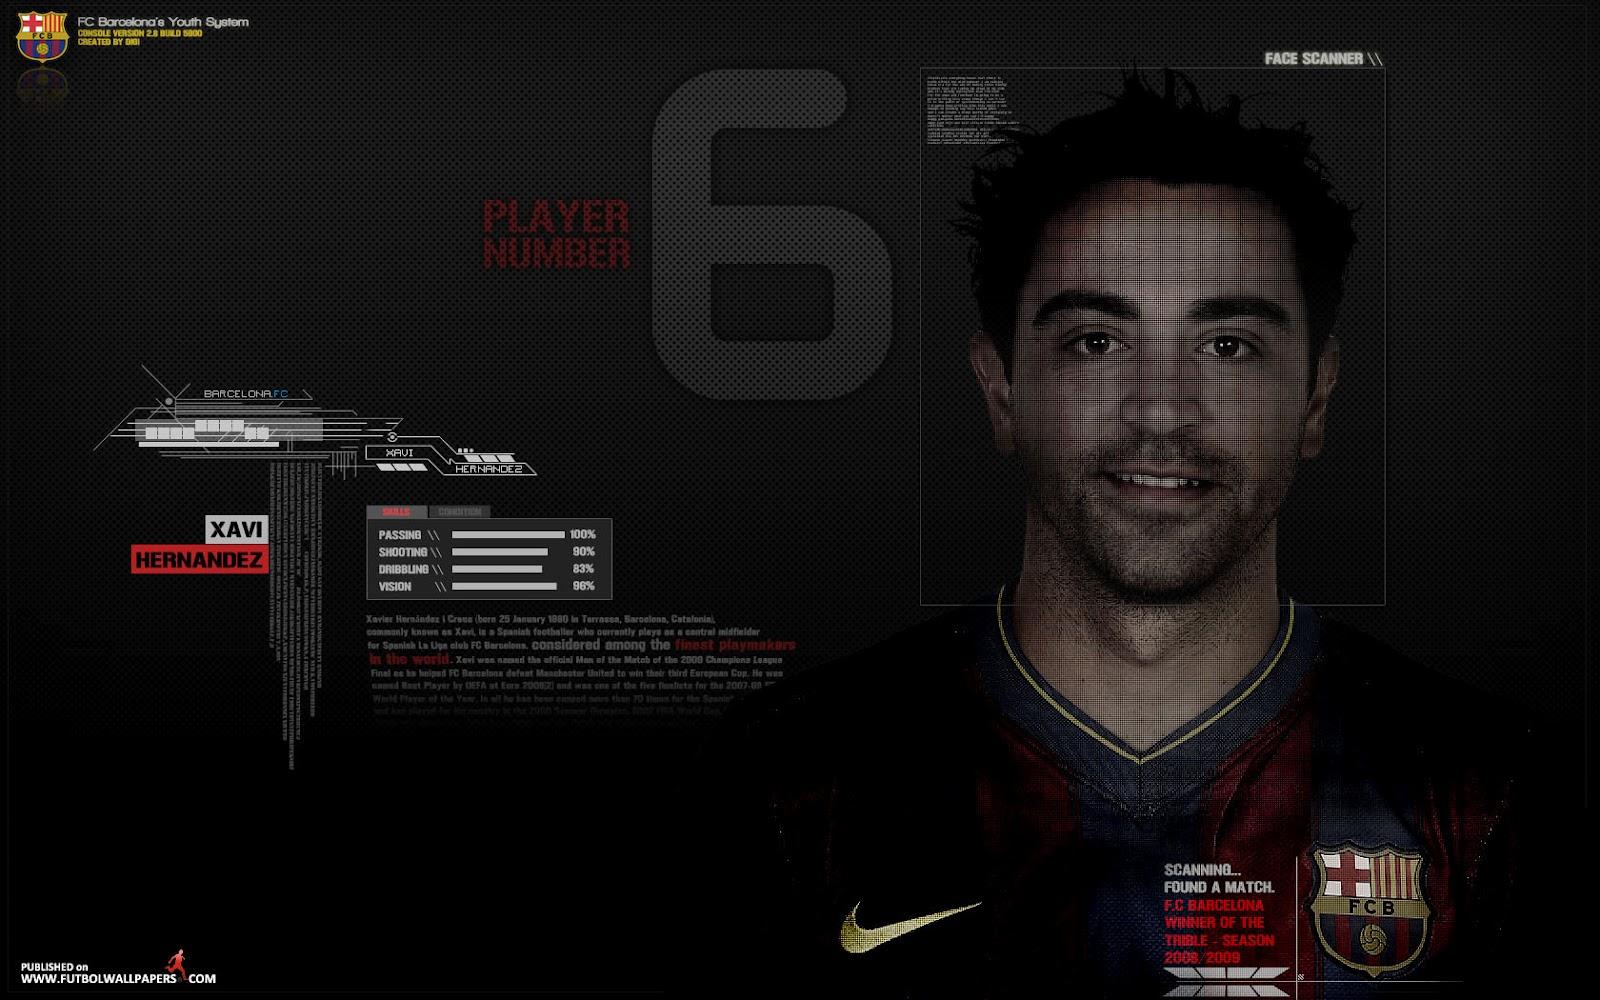 http://4.bp.blogspot.com/-FHIrjbwoFdQ/UCS2-0-E8eI/AAAAAAAAAqg/xJ8uC3DoqSU/s1600/football+wallpaper+-+xavi+hernandez+2.jpg